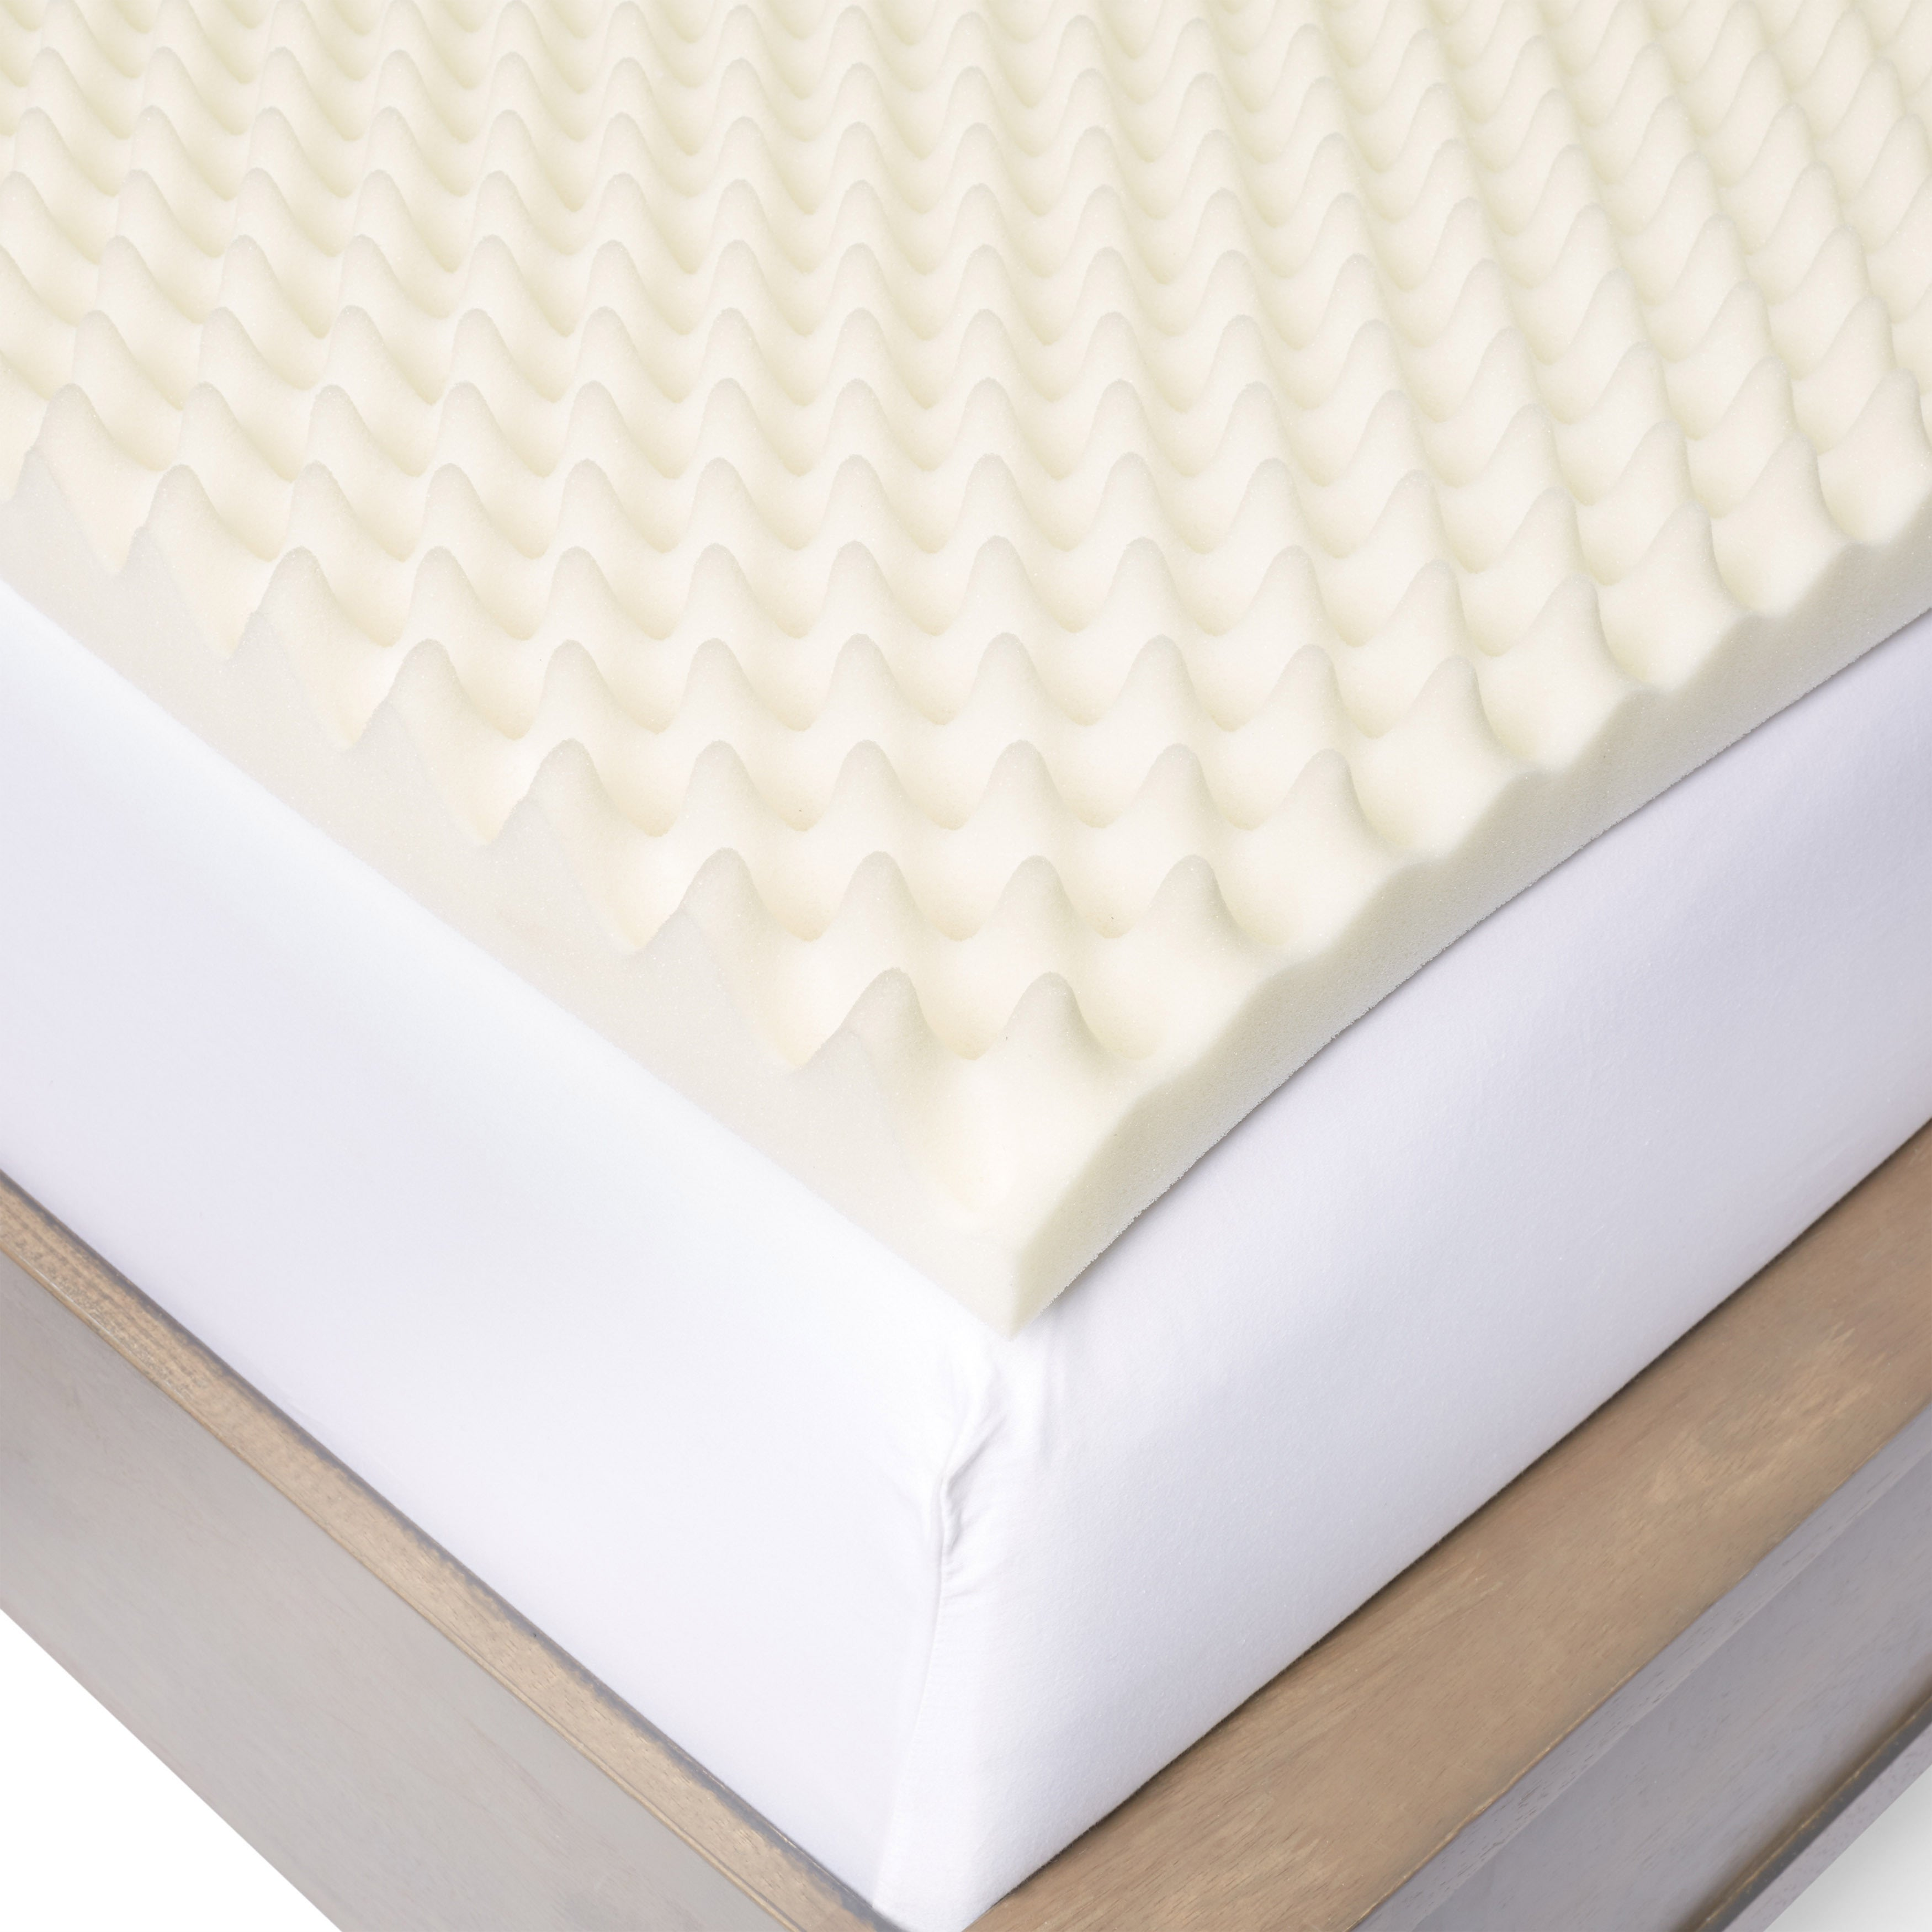 full lane pads foam pad topper mattress toppers in memory gellux gel p